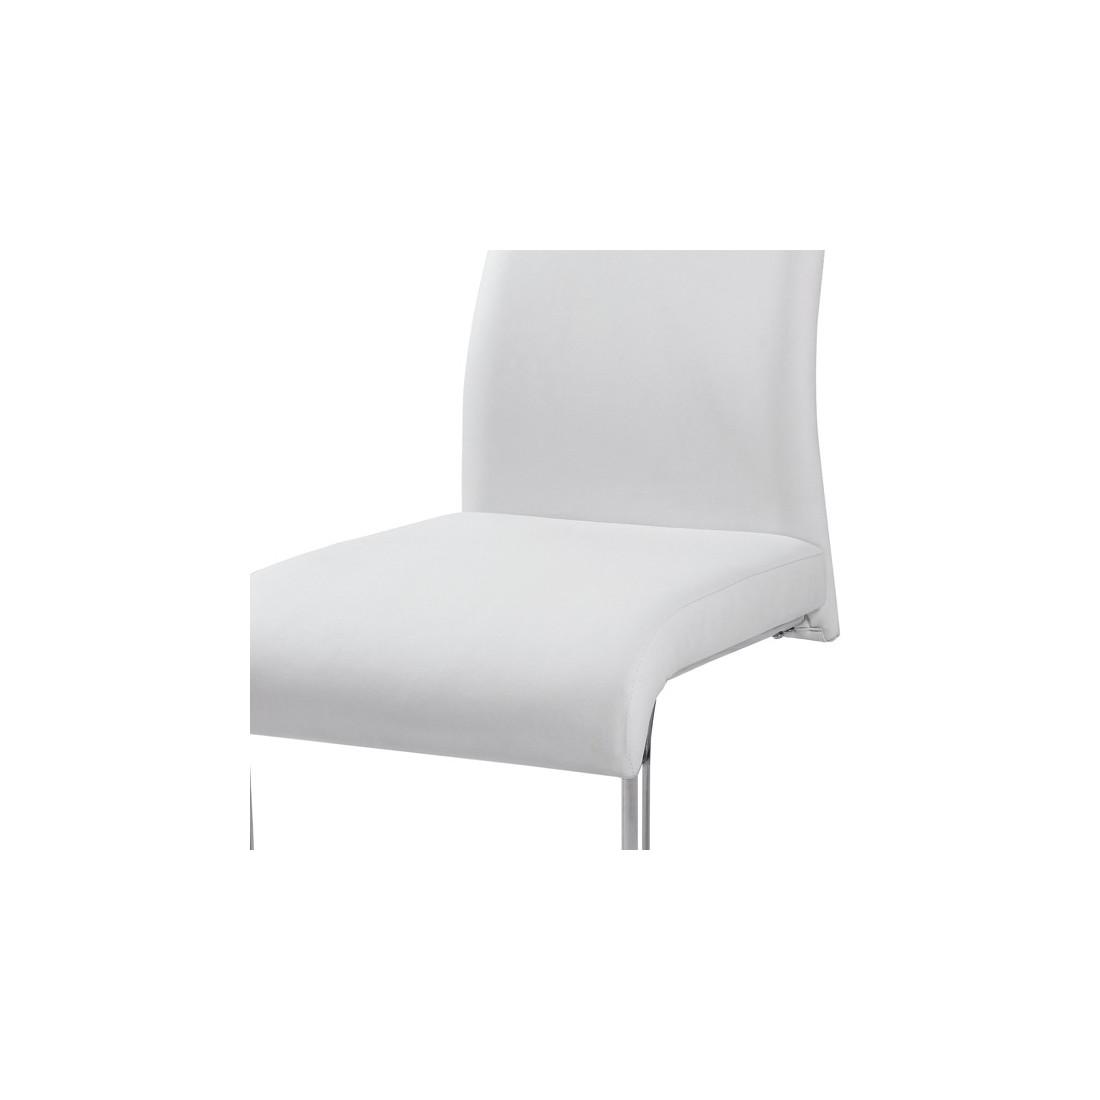 Chaises blanches simili cuir 28 images quatuor de for Chaise salle a manger simili cuir blanc